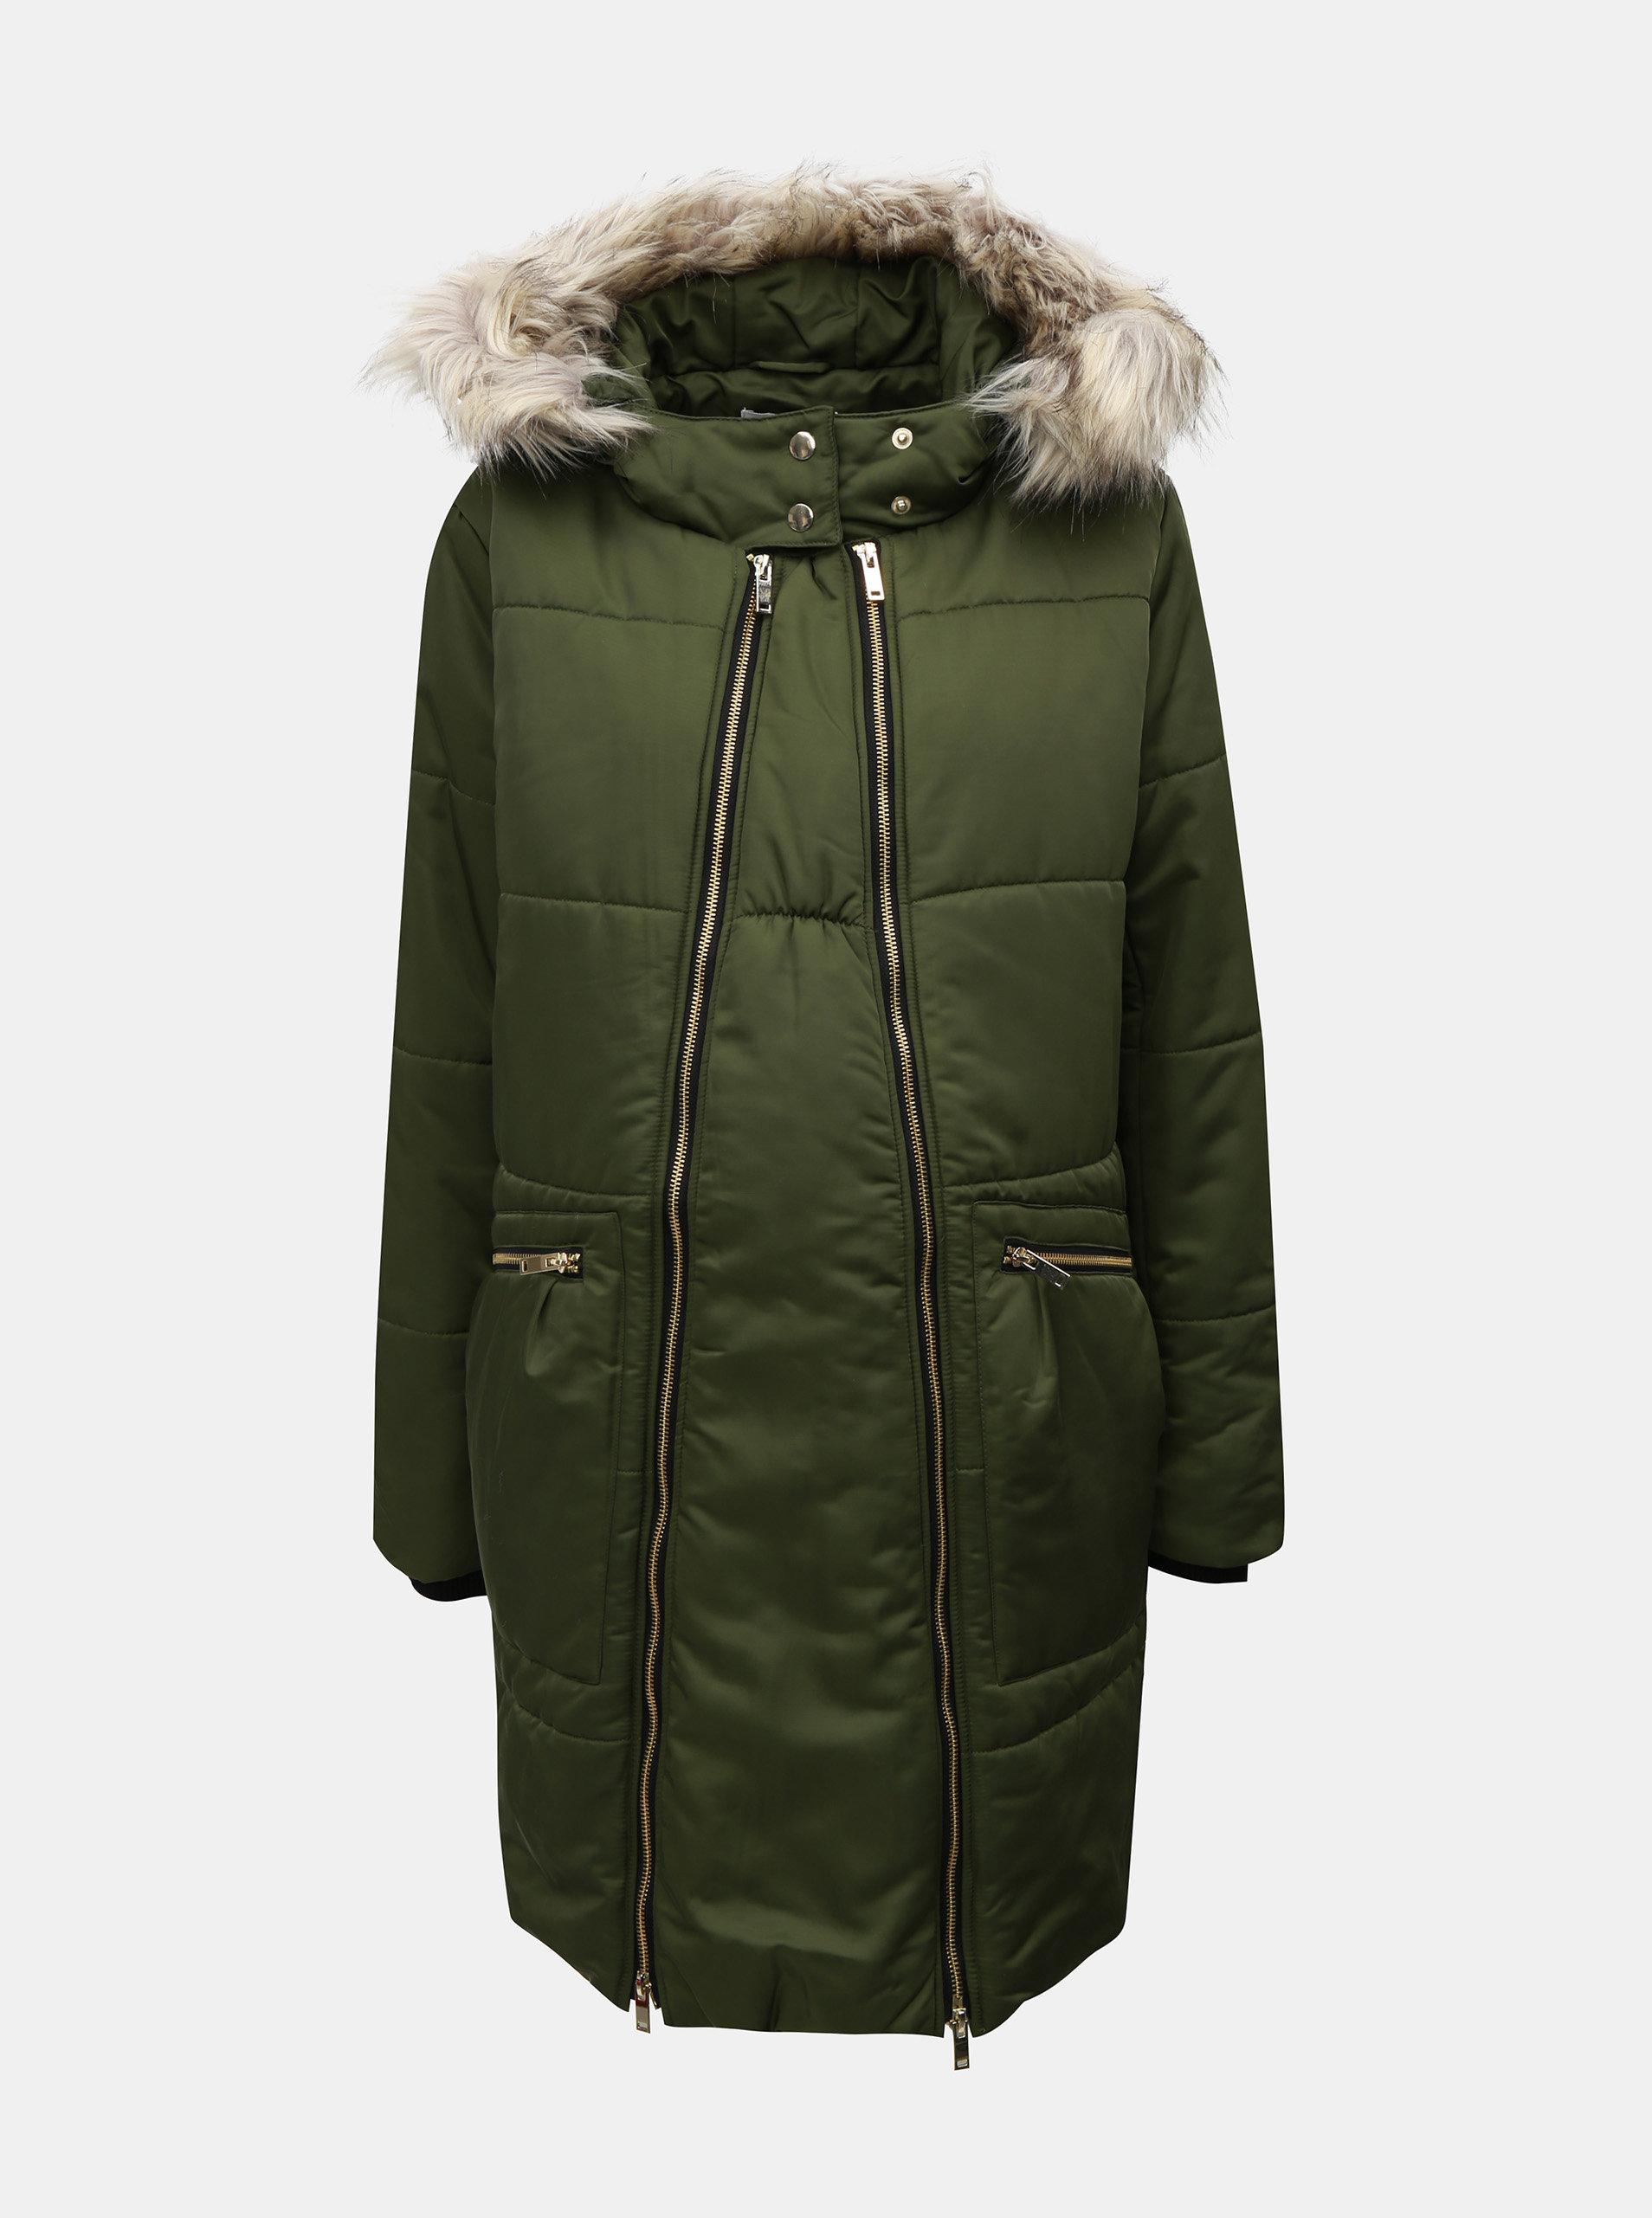 Zelená prešívaná zimná tehotenská bunda Mama.licious ... b7a5cf11a55